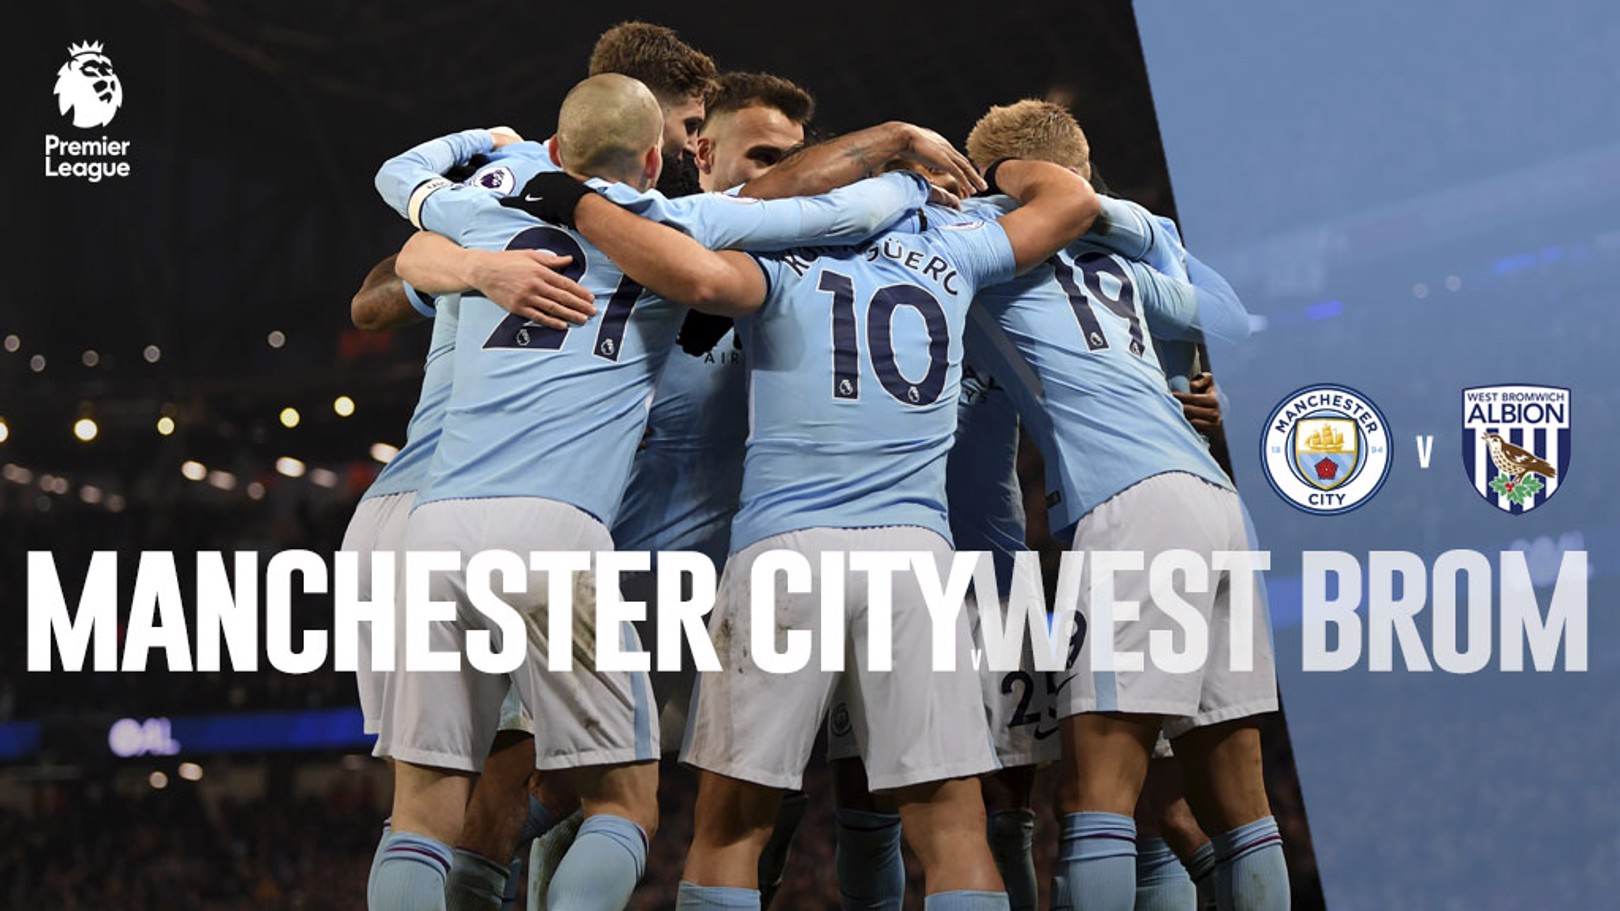 Man City x West Brom